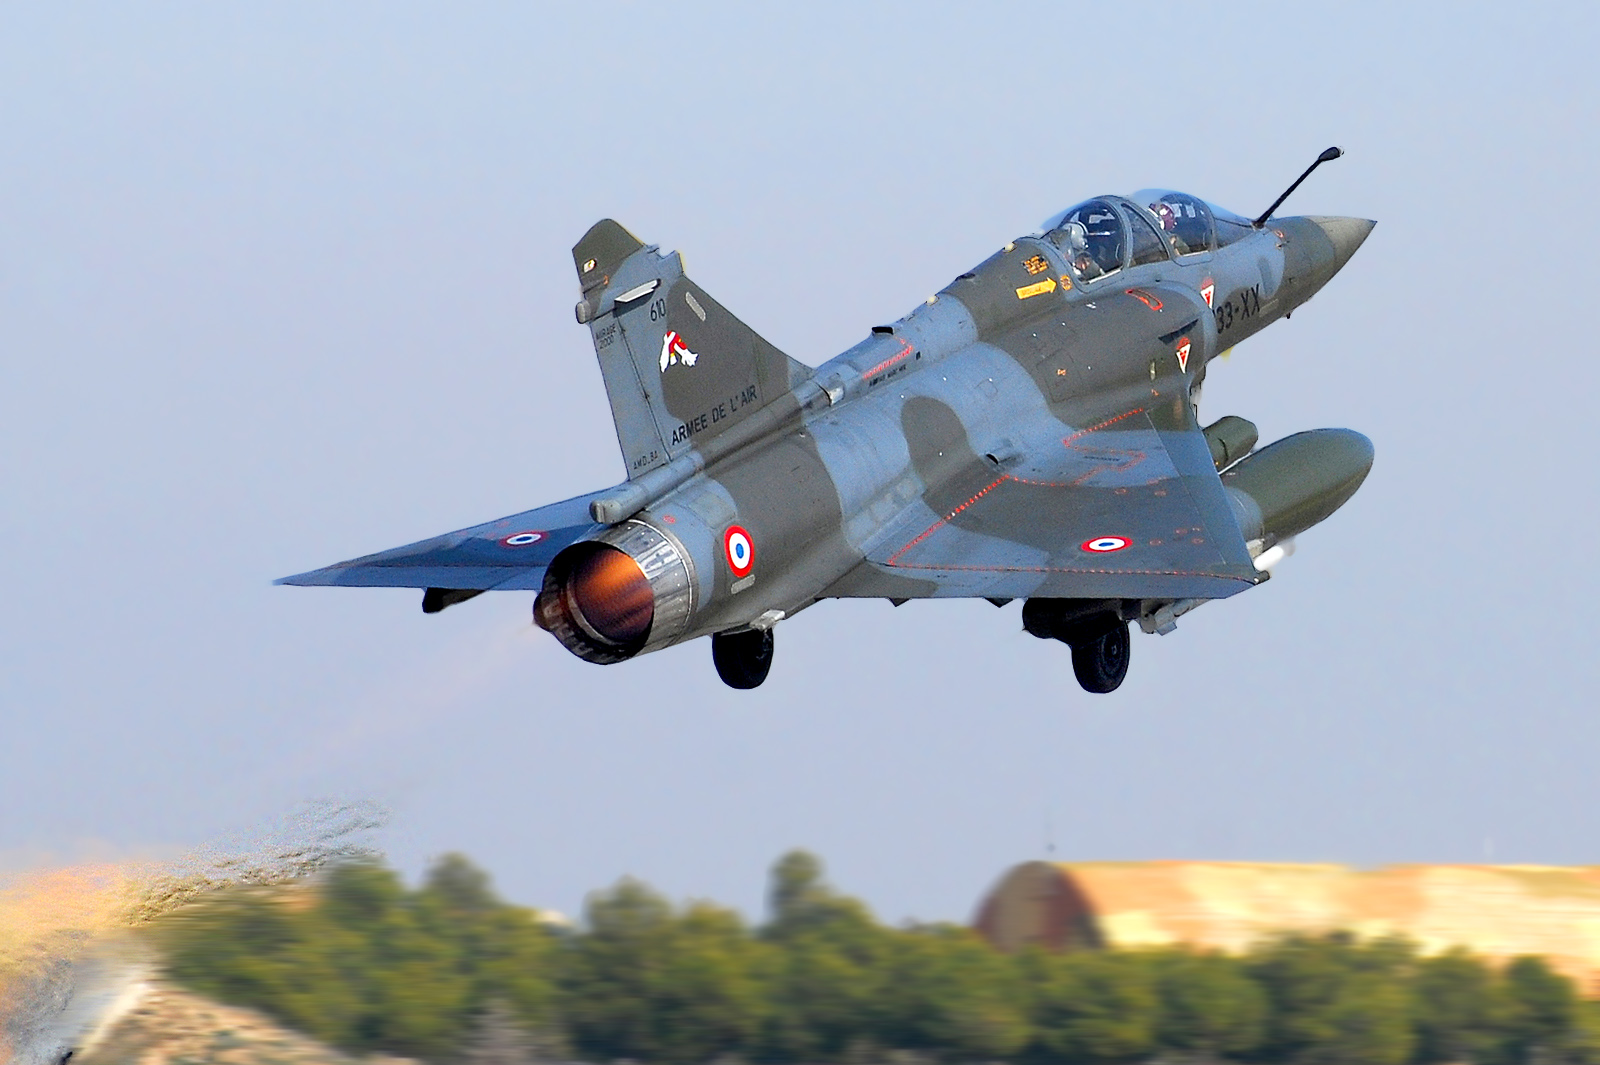 Mirage 2000 de la Fuerza Aérea Francesa